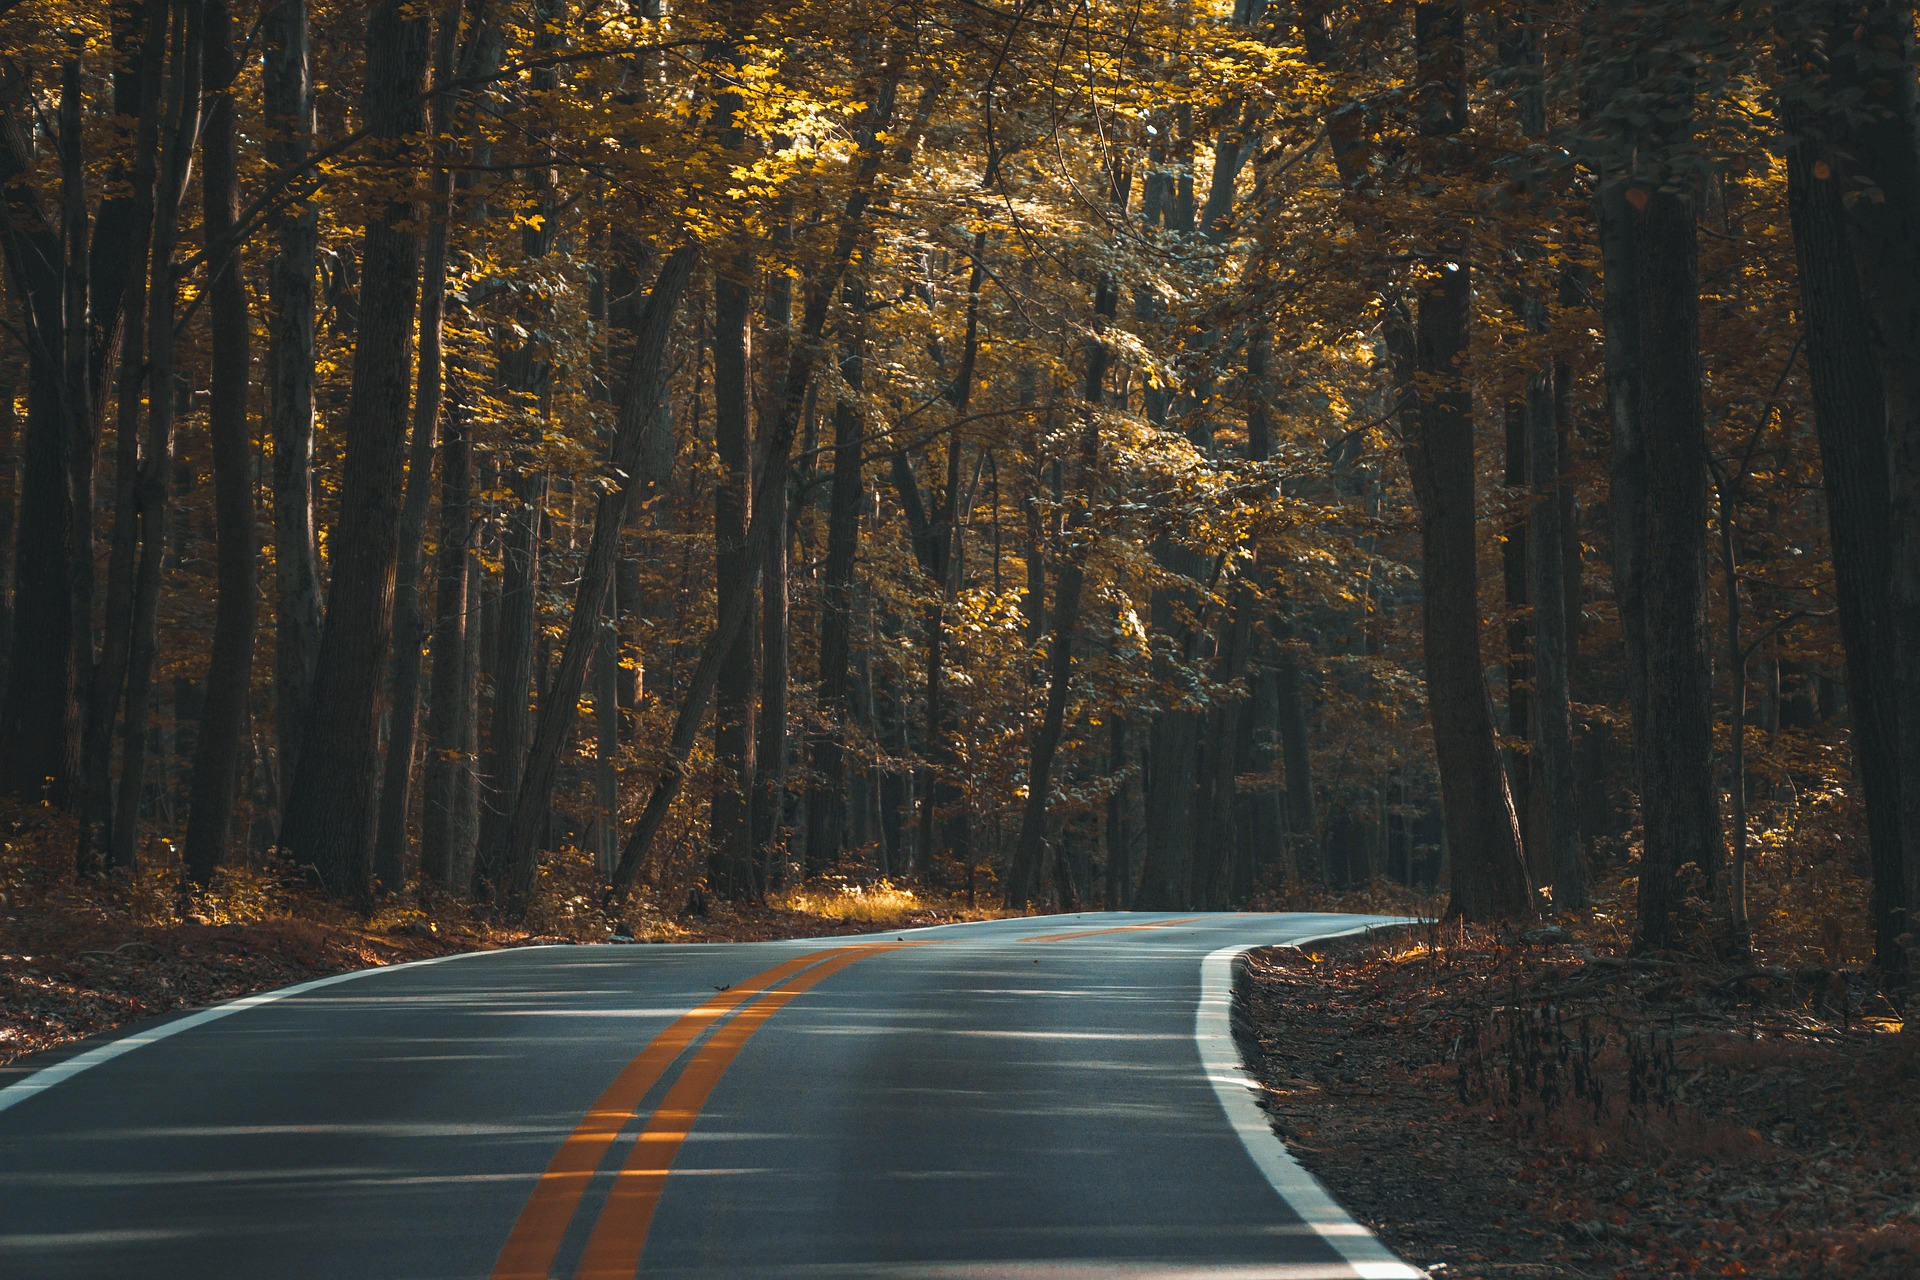 asphalt-1867667_1920